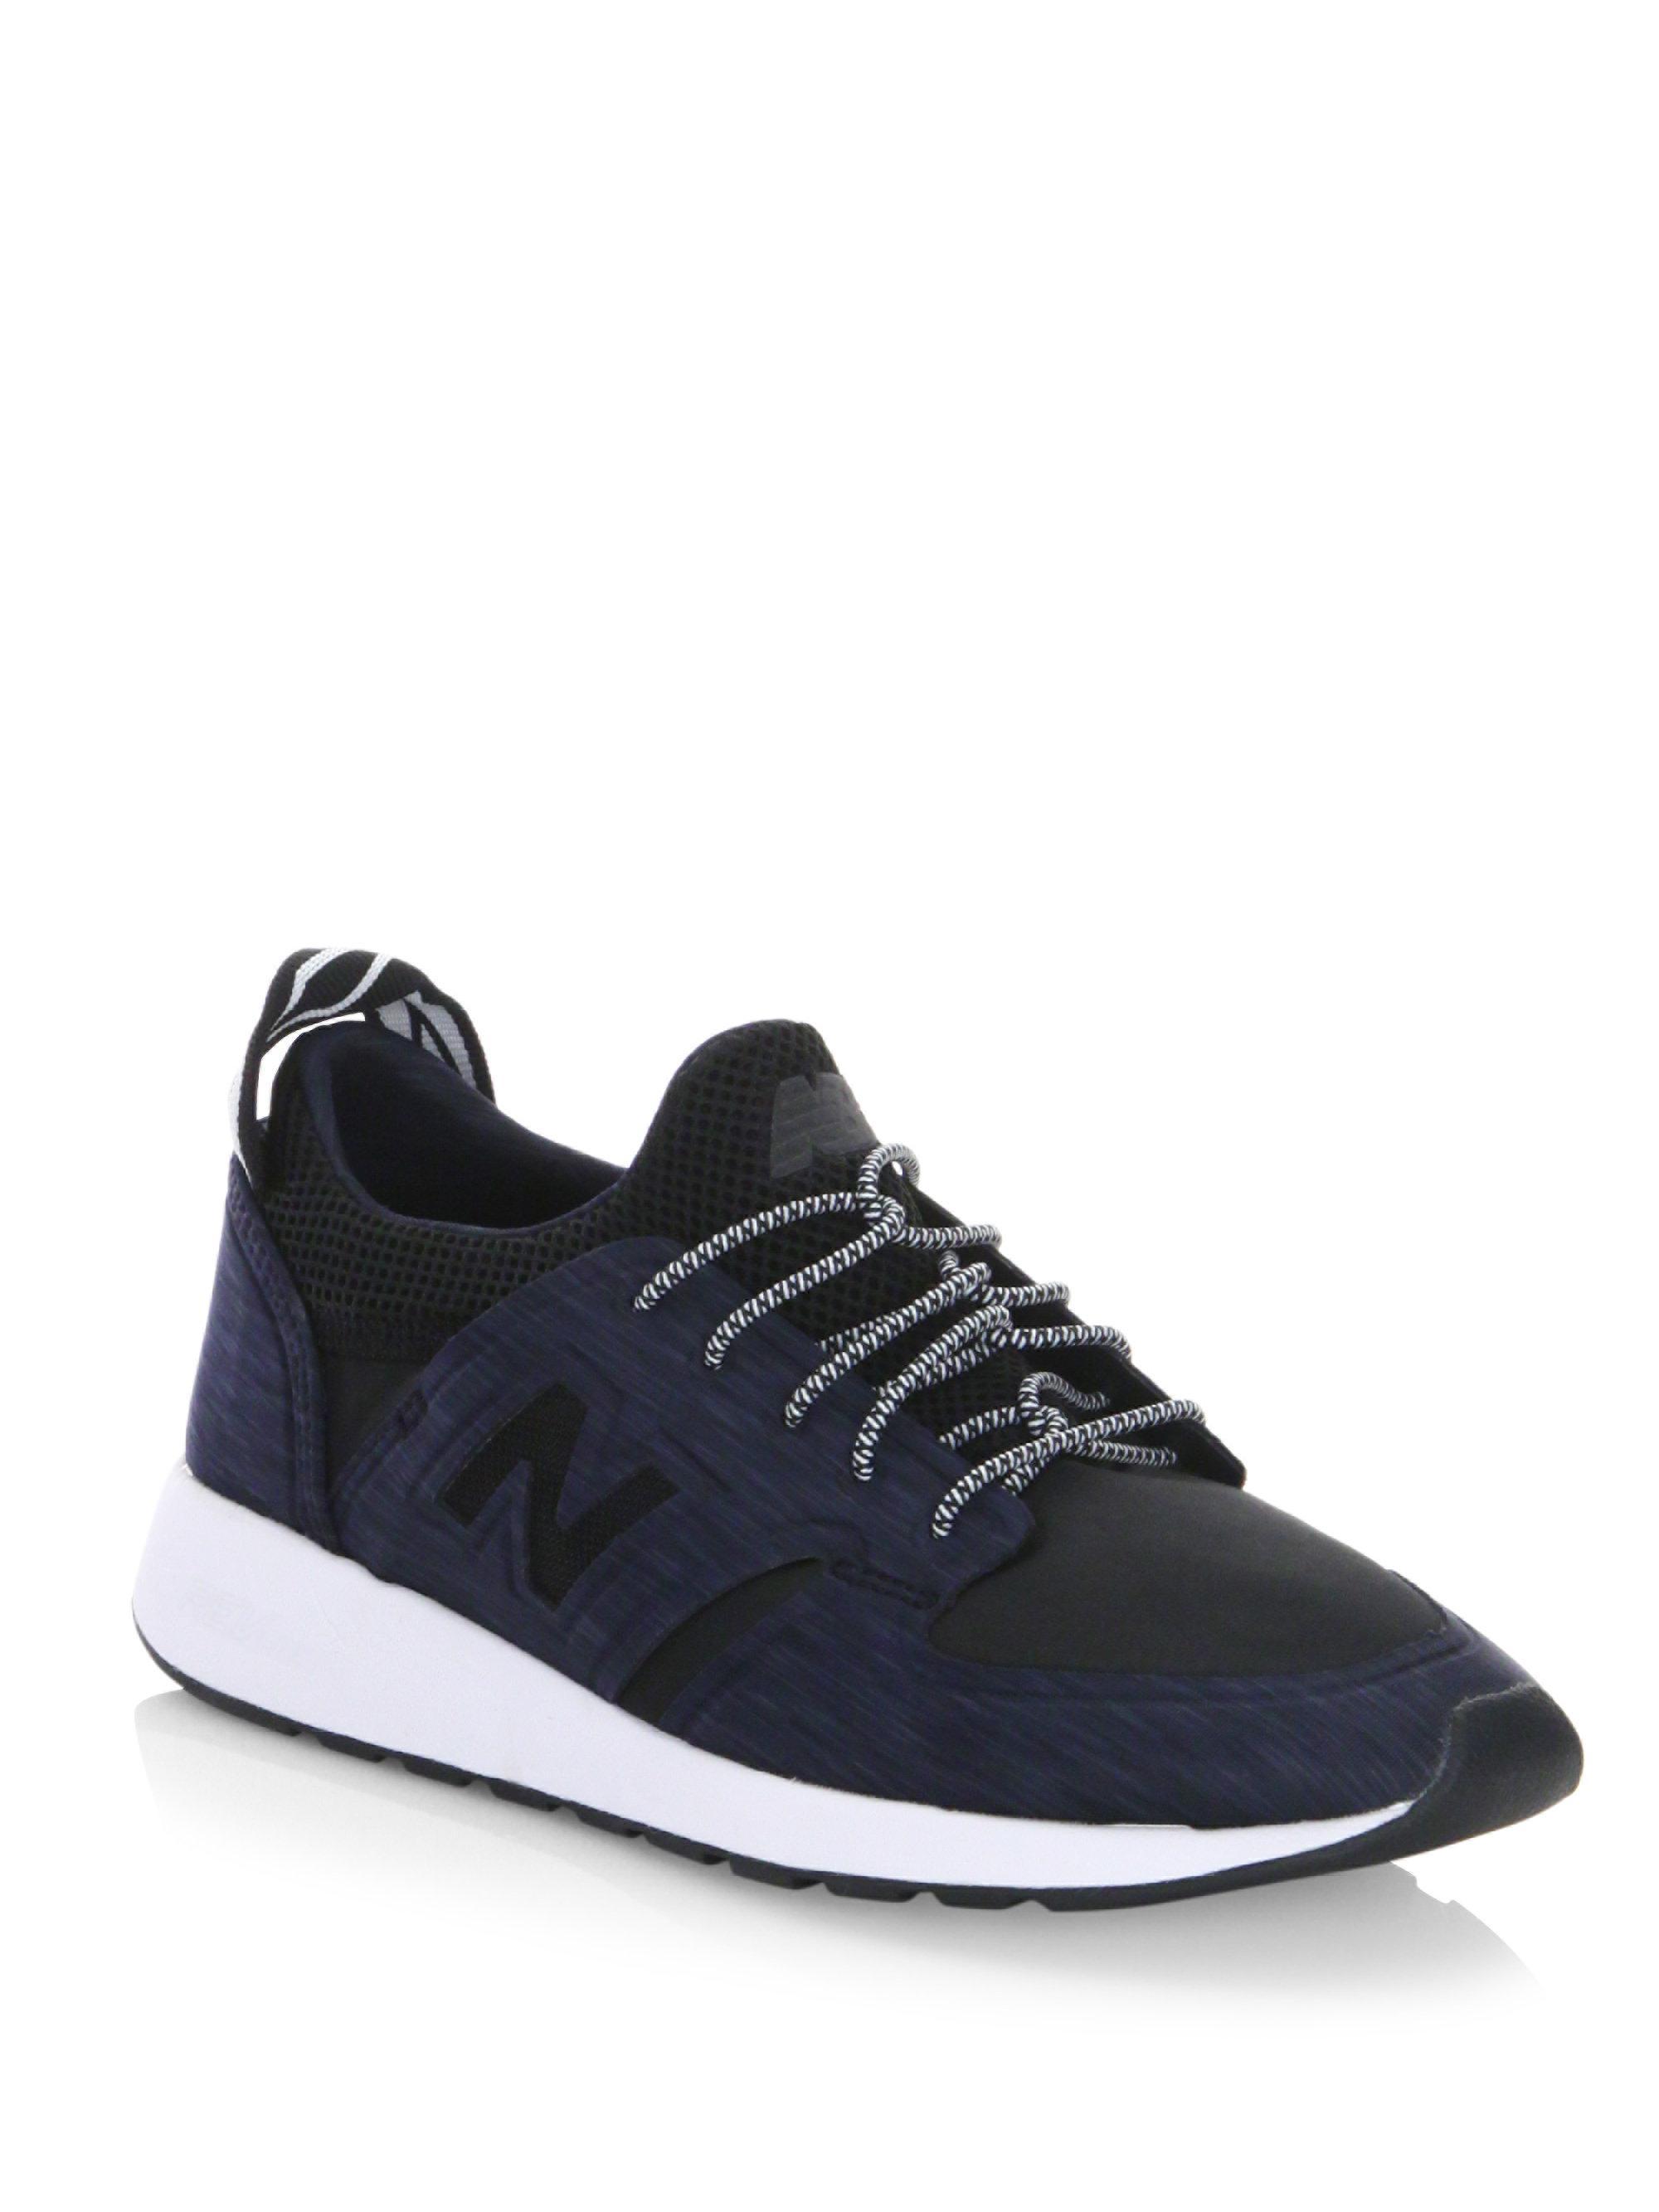 new balance wrl420 black